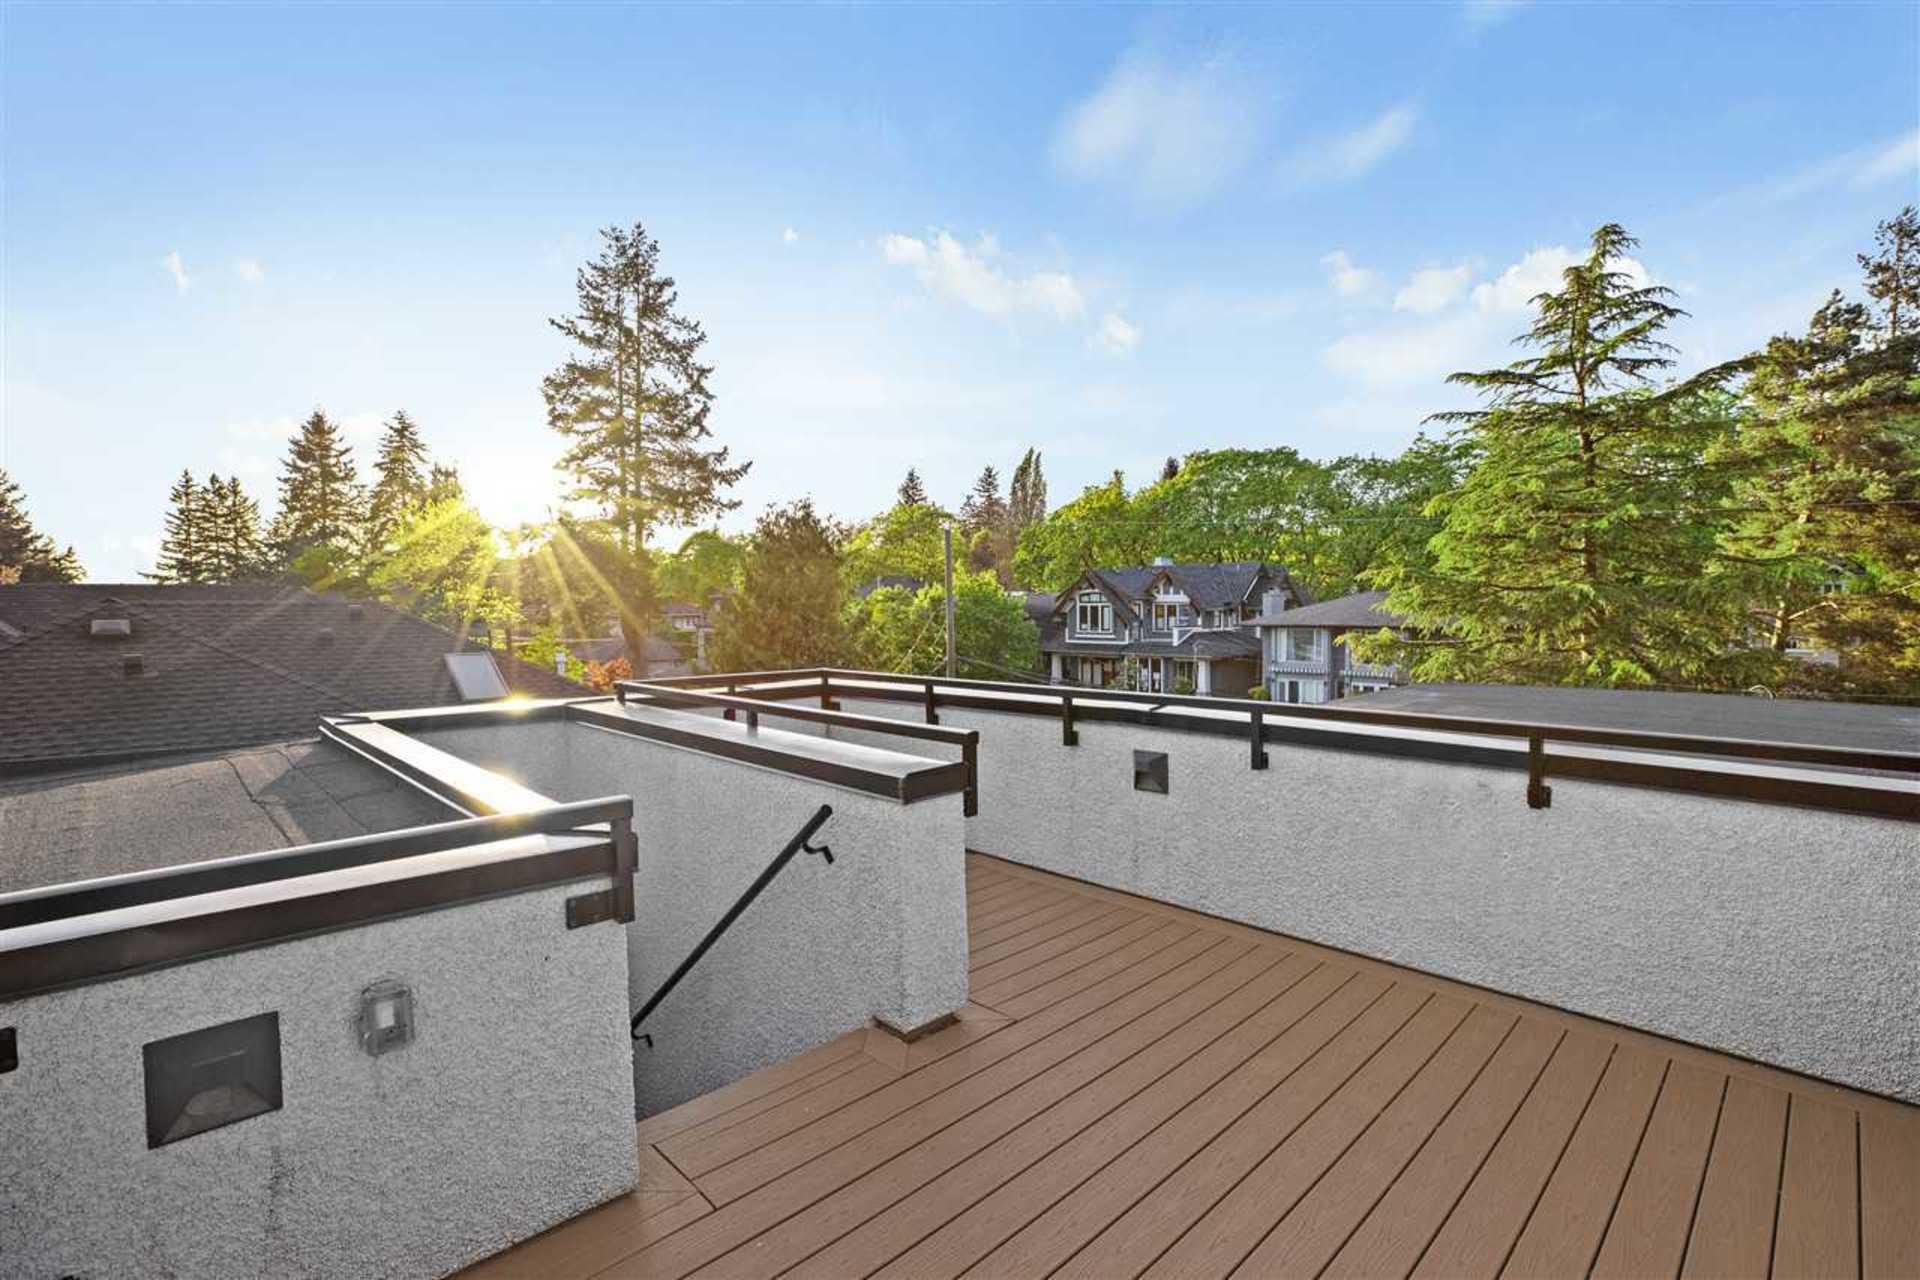 3707-w-37th-avenue-dunbar-vancouver-west-38 at 3707 W 37th Avenue, Dunbar, Vancouver West